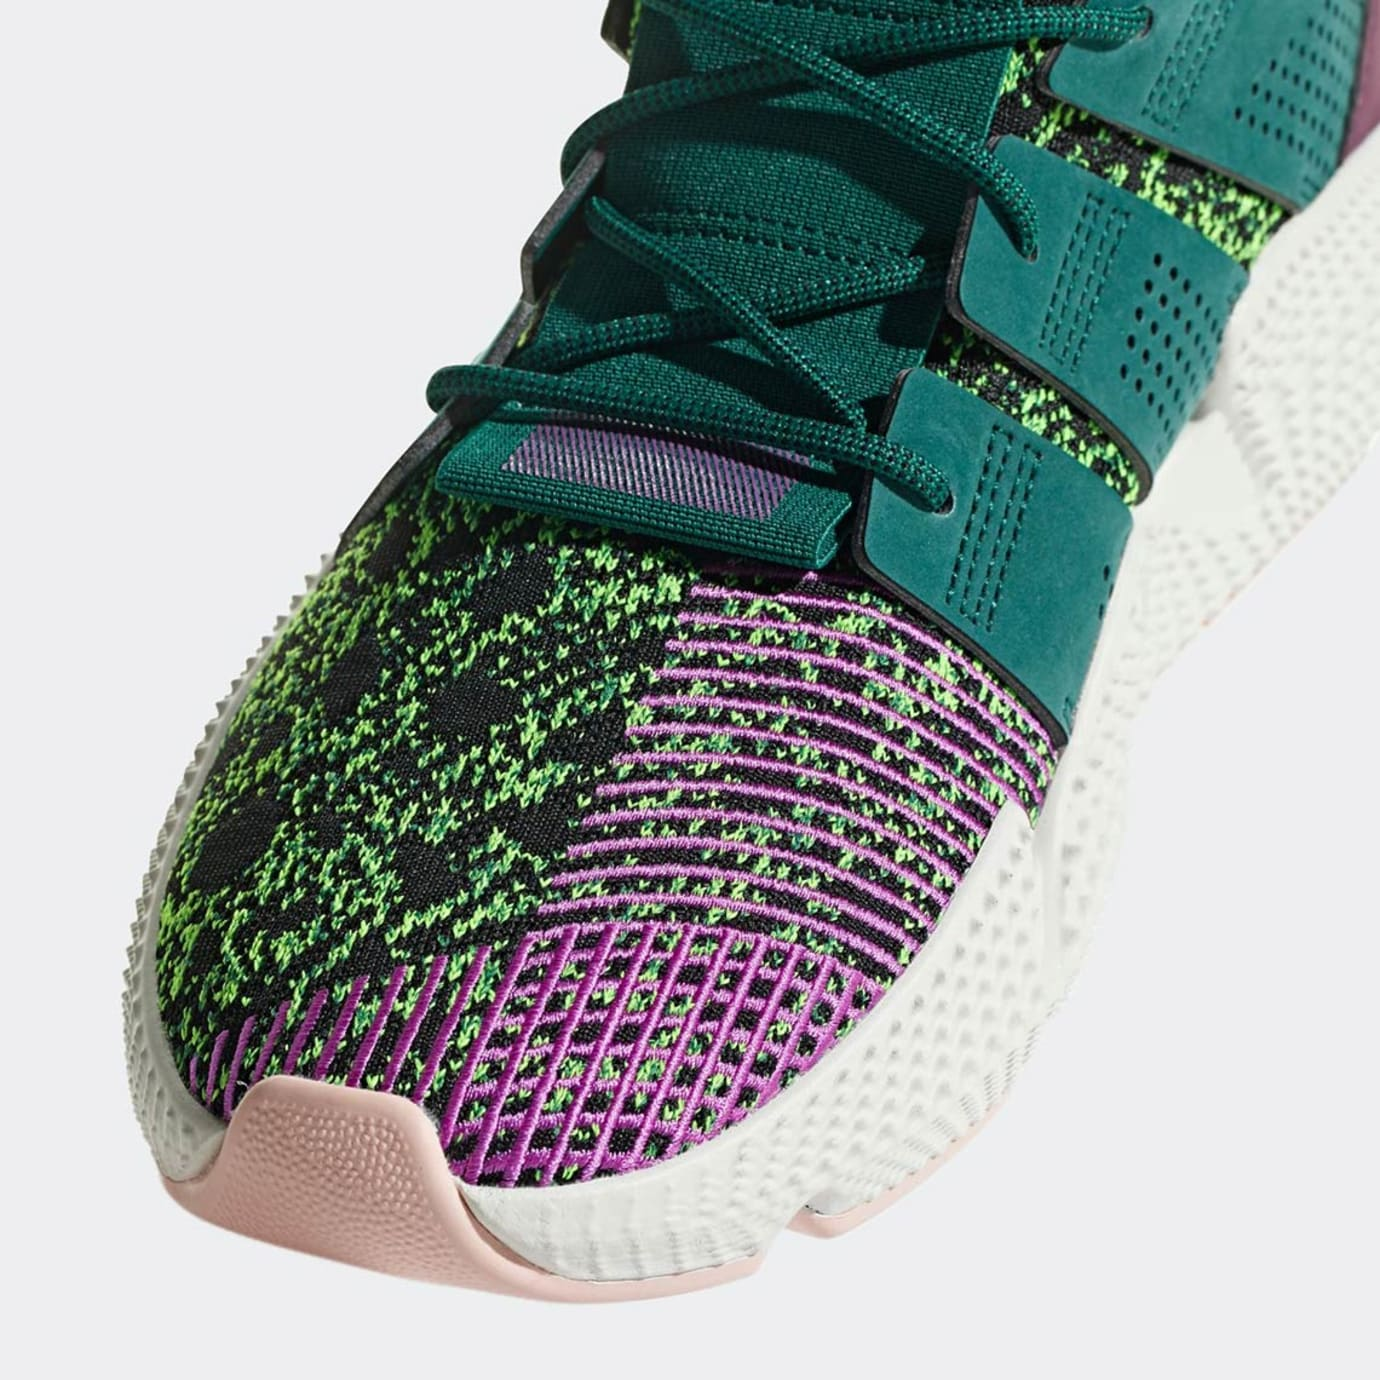 Cell Ball Z Adidas Dragon New Brand Bd2b3 804f2 XZOiPkTu